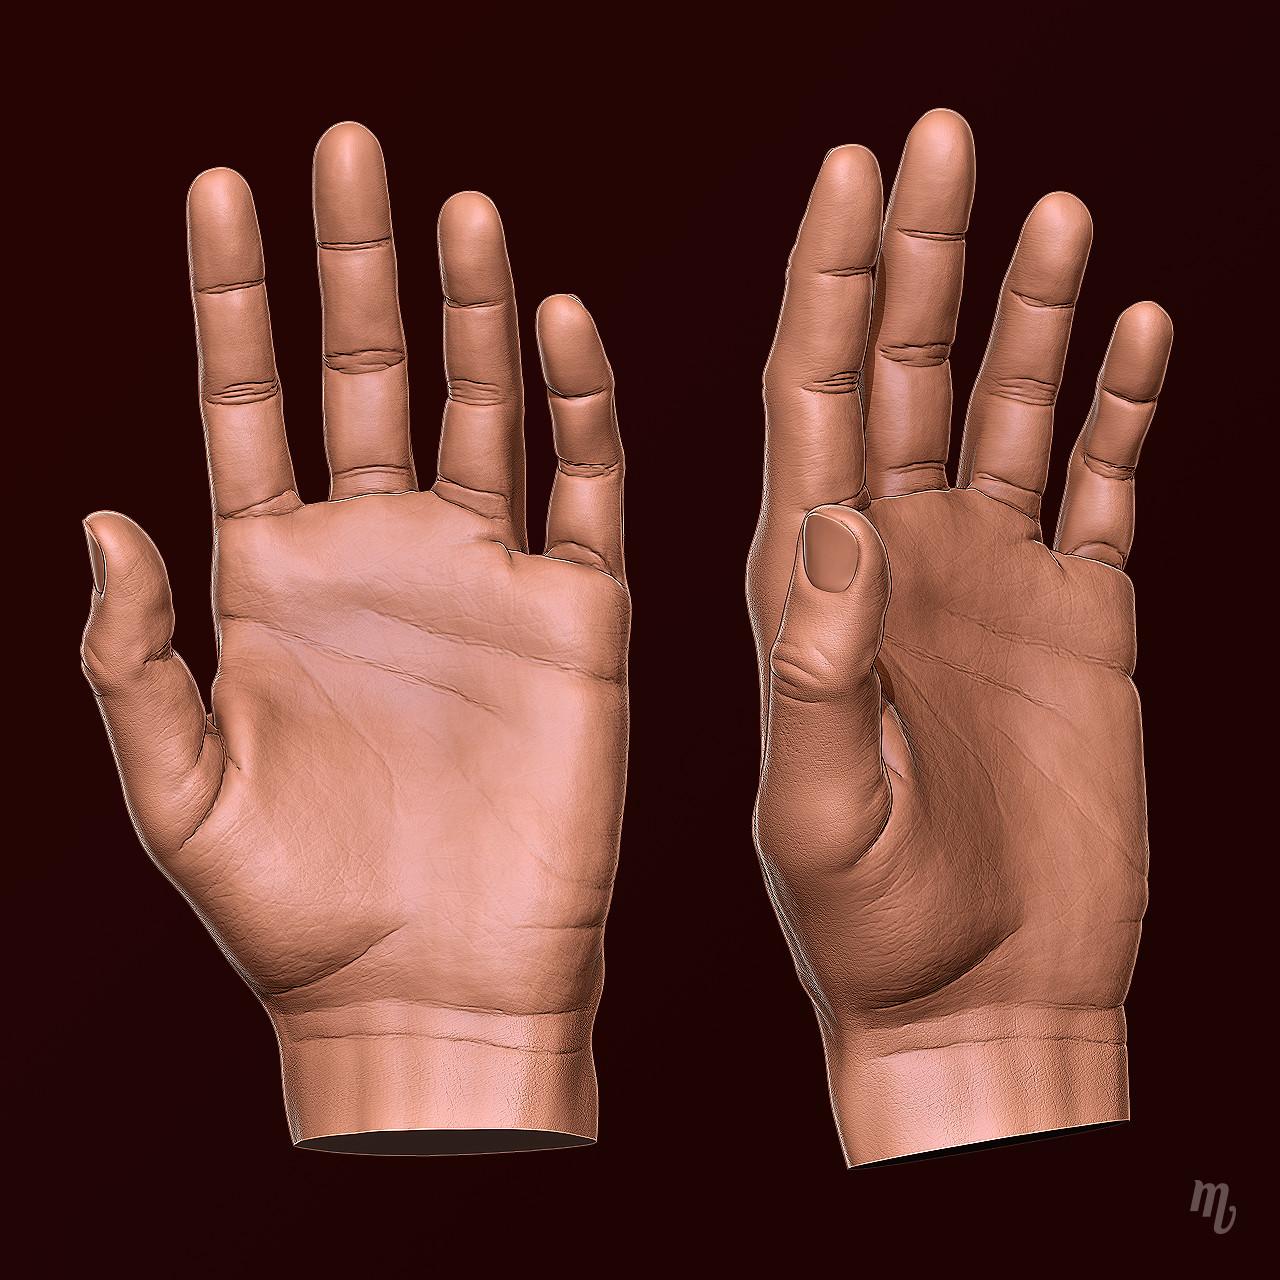 Marc virgili hand 07